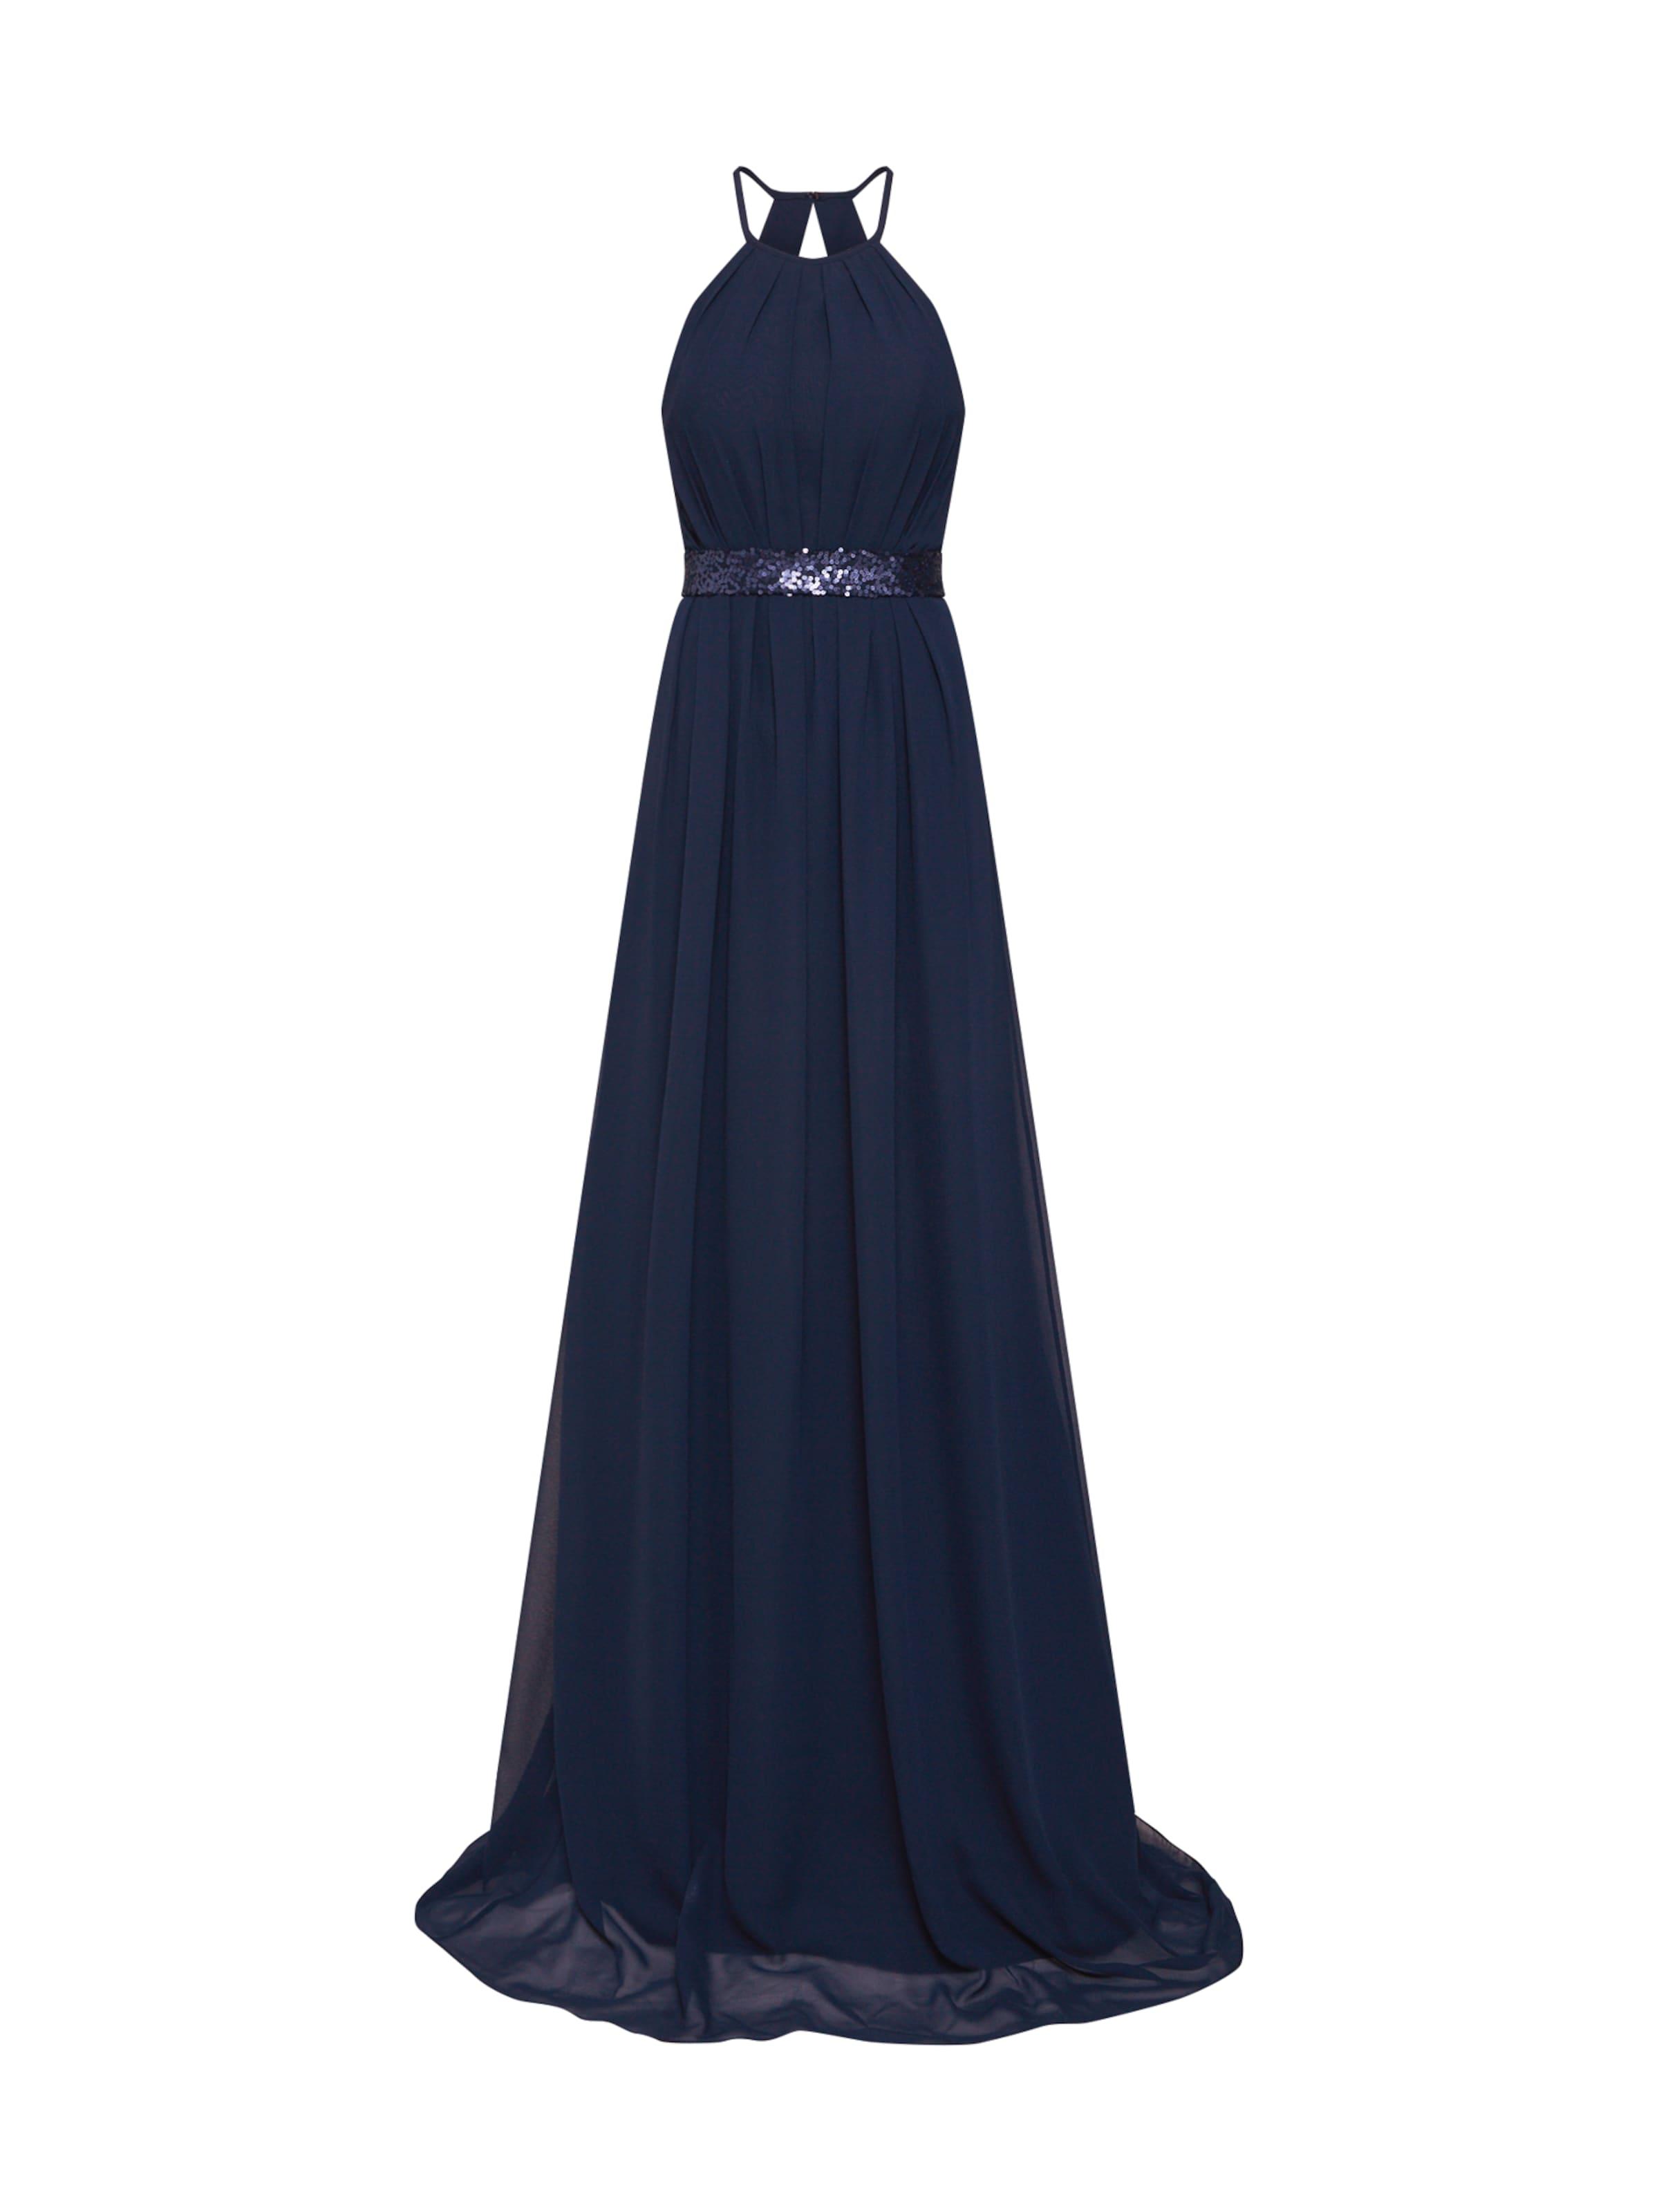 Night In Dress Abendkleid 'long Chiffonamp; Sequins' Star Navy K1JcTF3l